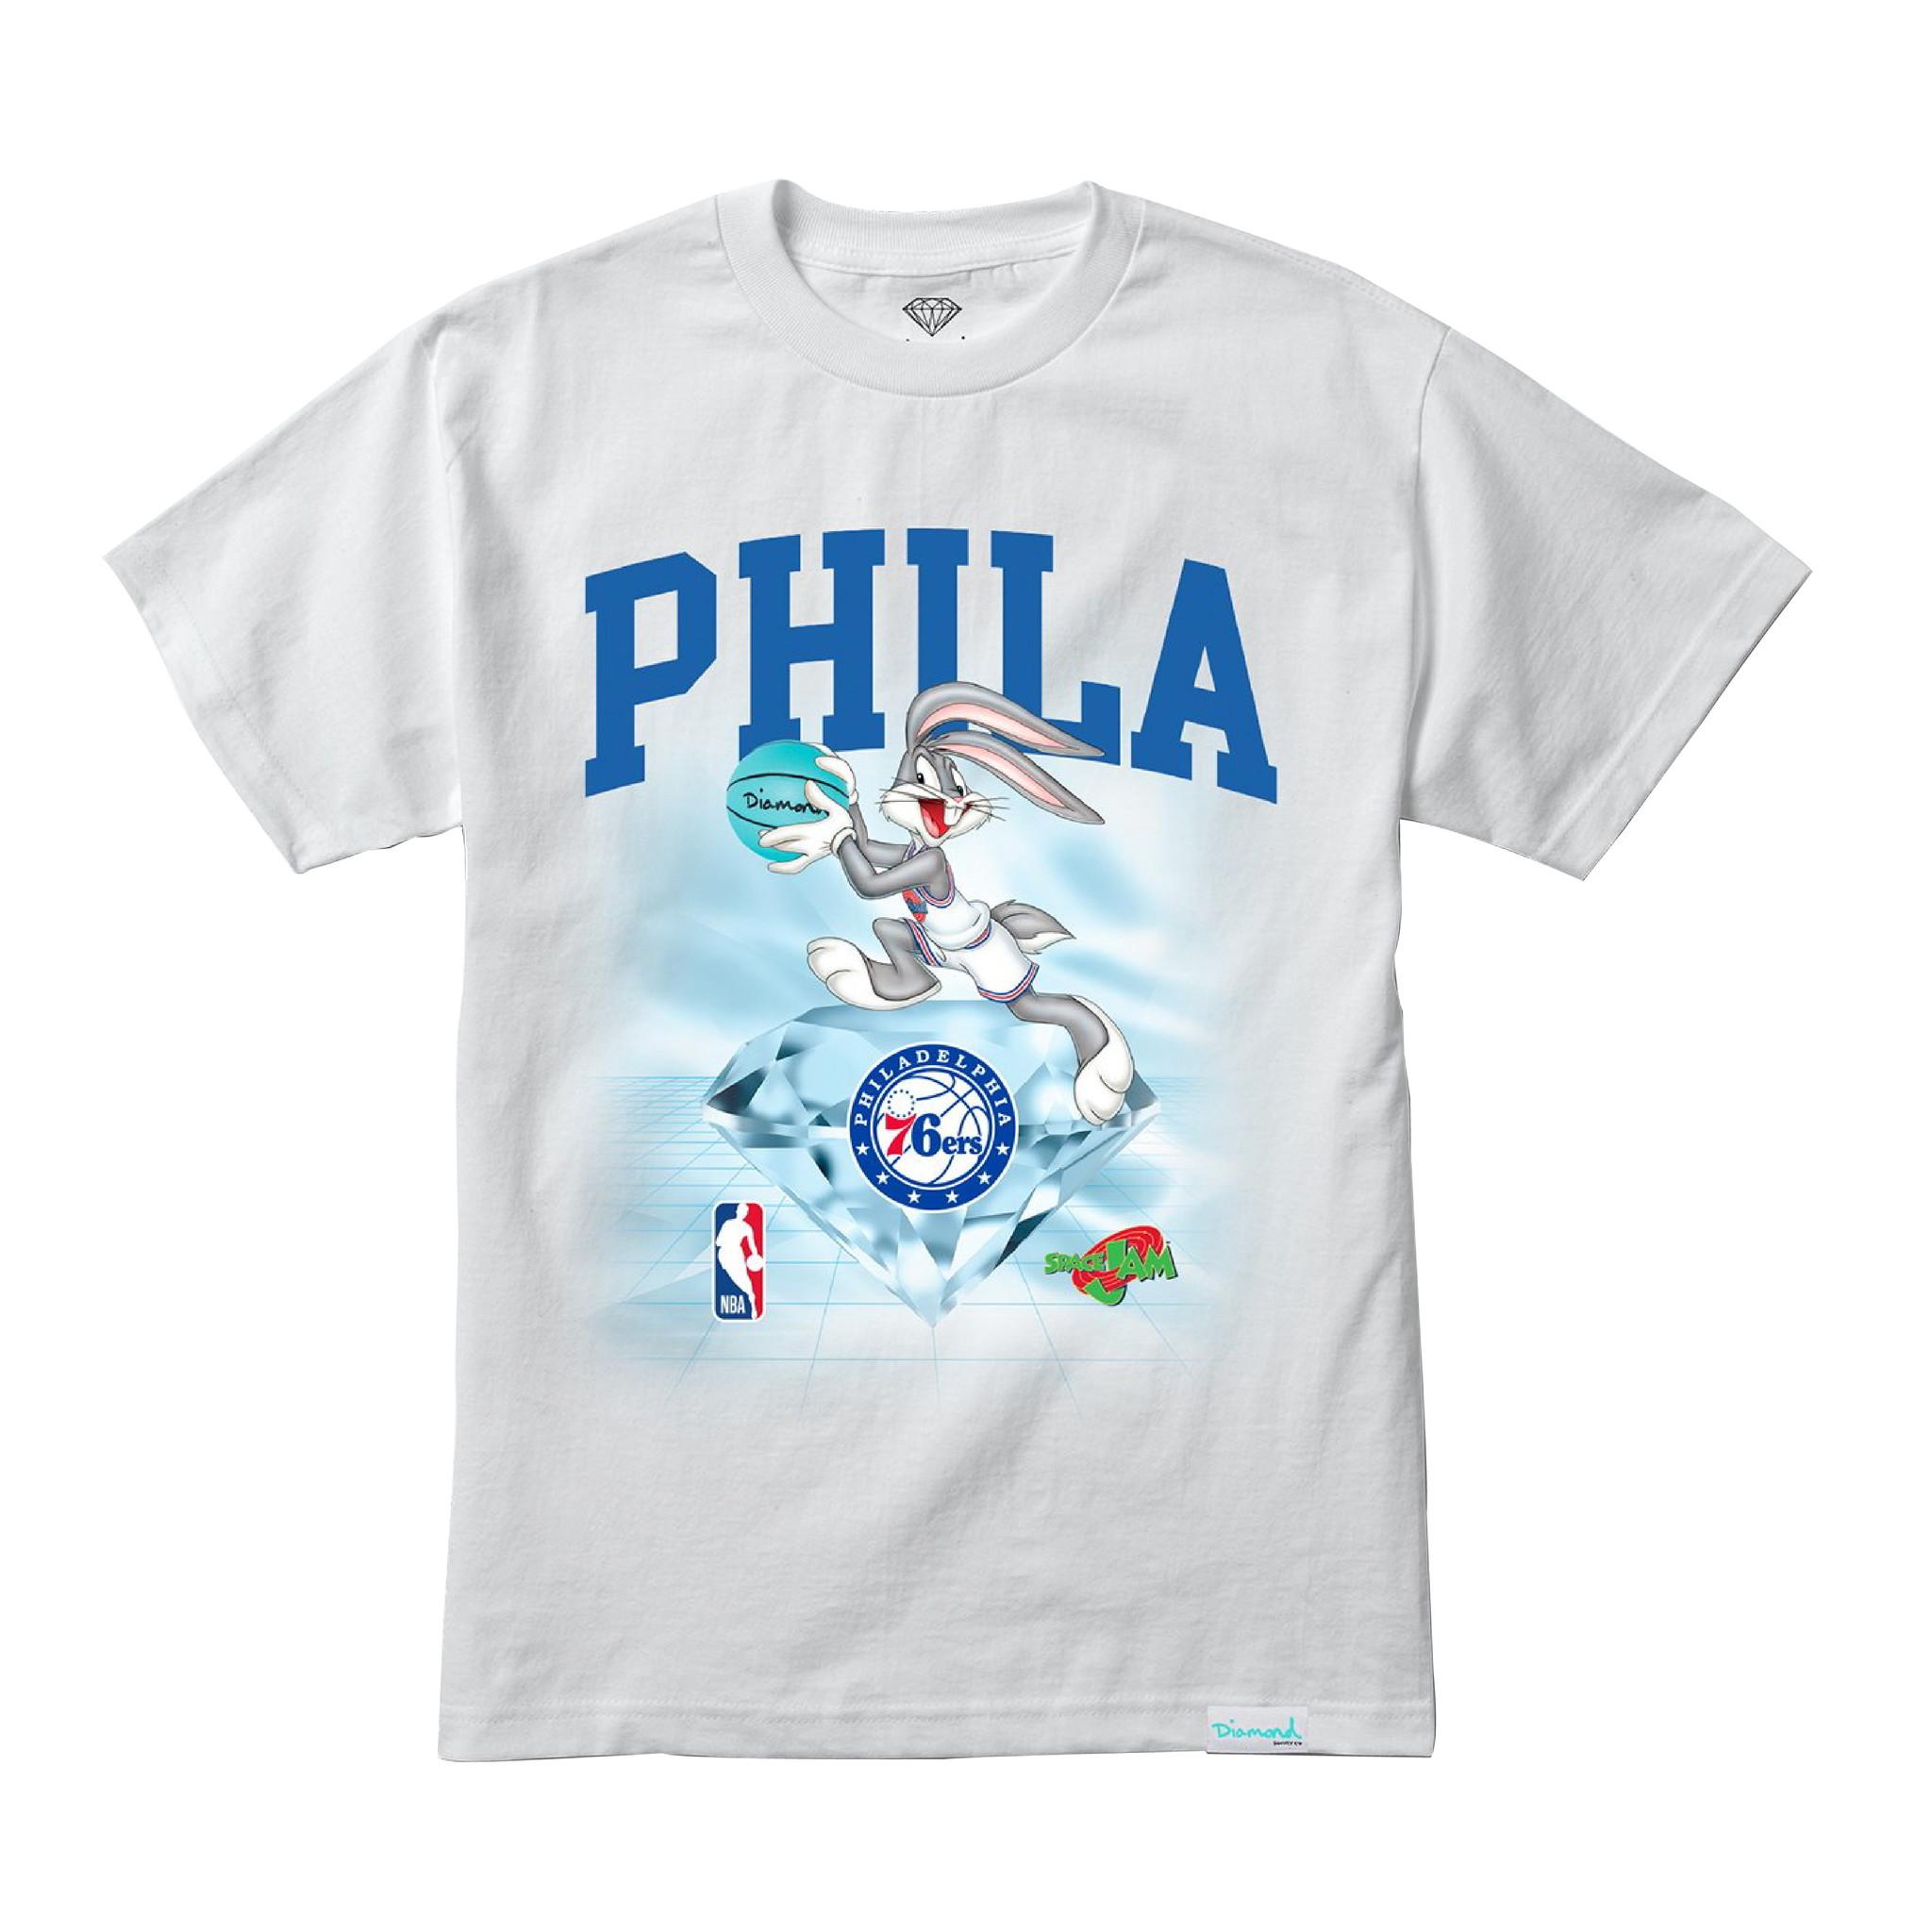 DIAMOND x SPACE JAM x NBA 76ERS T-SHIRT